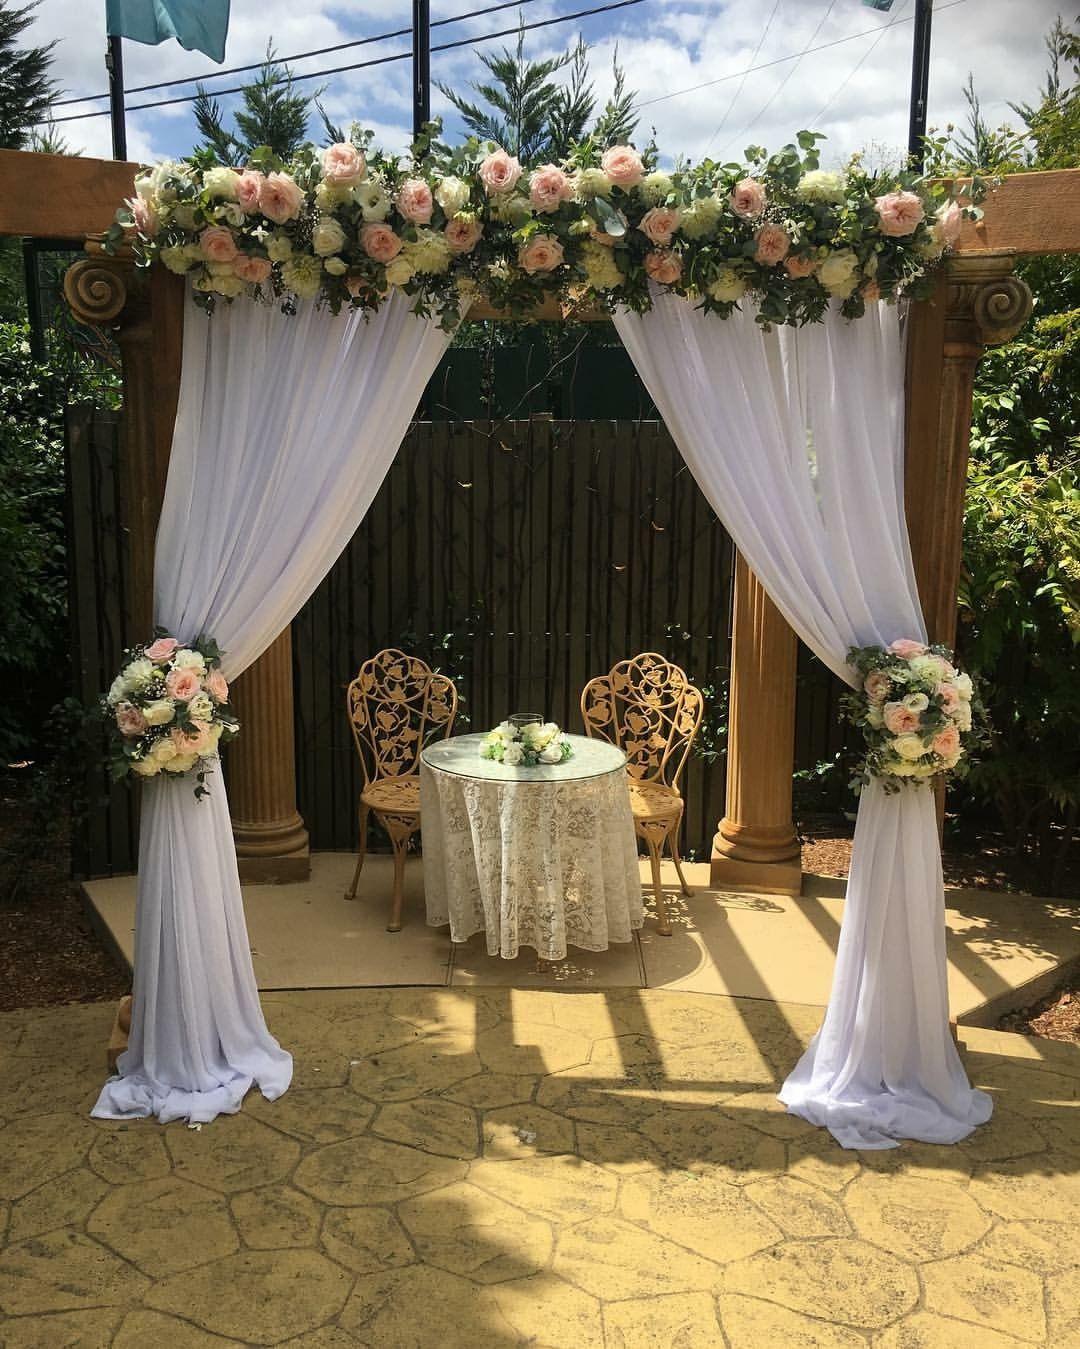 Visually Creative Flowers And Events Styling Sydney Nsw Backyard Wedding Wedding Props Sydney Wedding